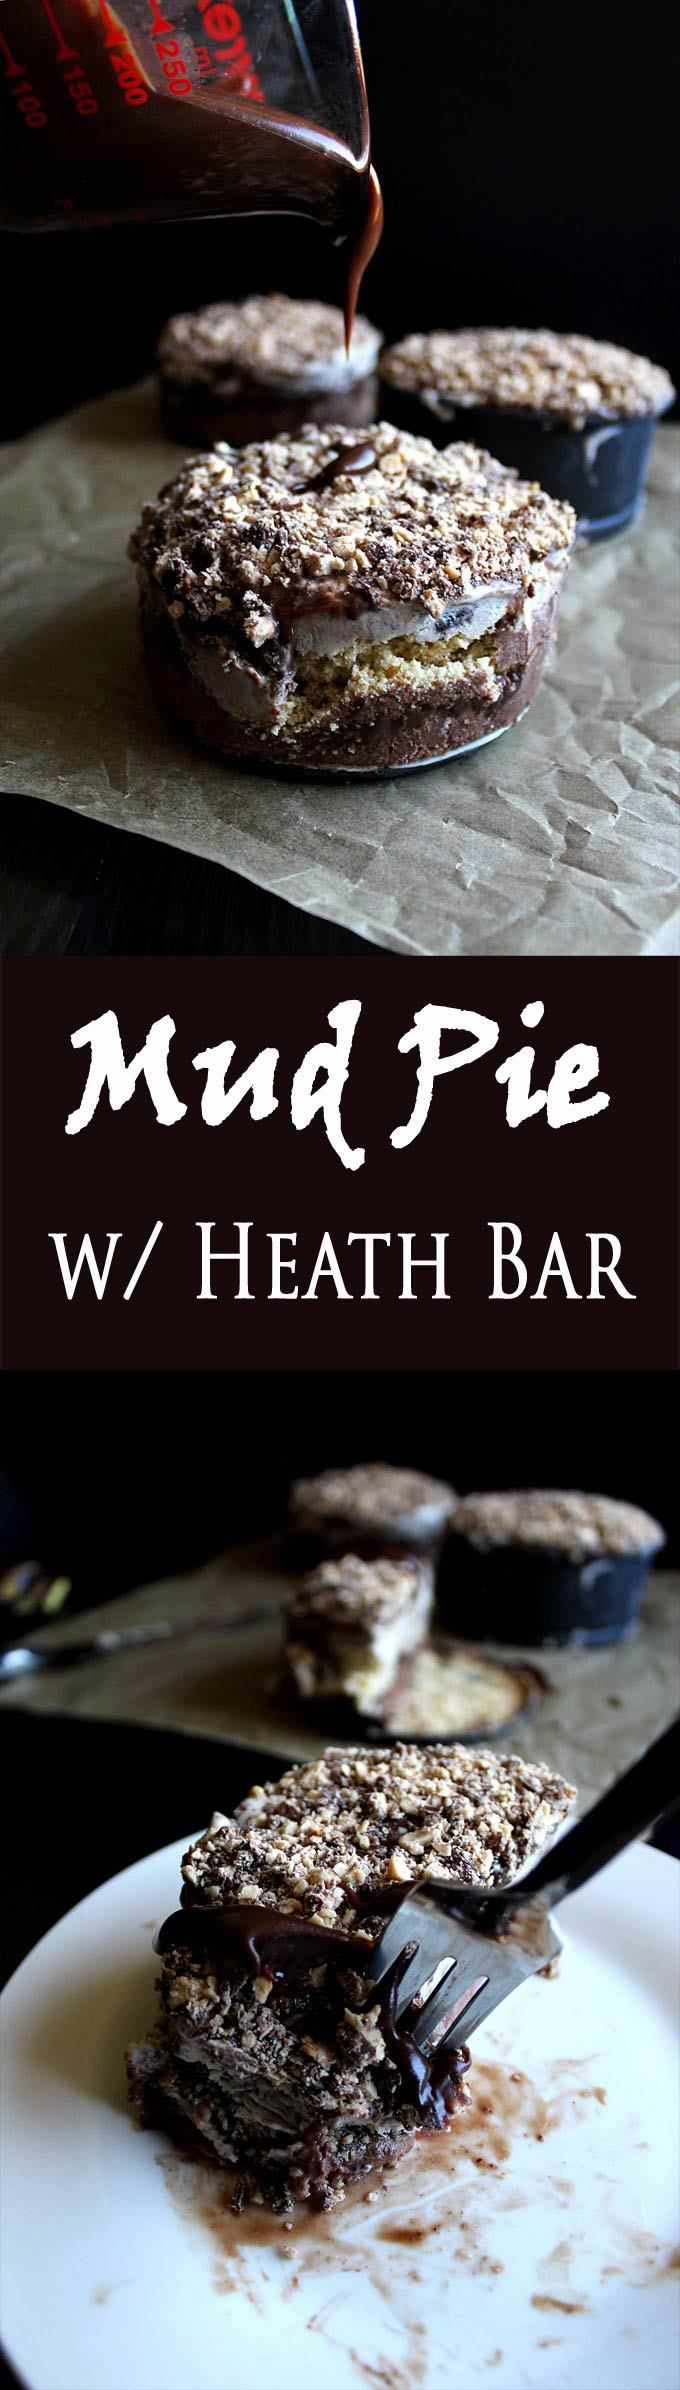 Mud Pie Recipe   Heath Bar   Ice Cream   Crushed Cookies   Homemade Hot Fudge   Dessert